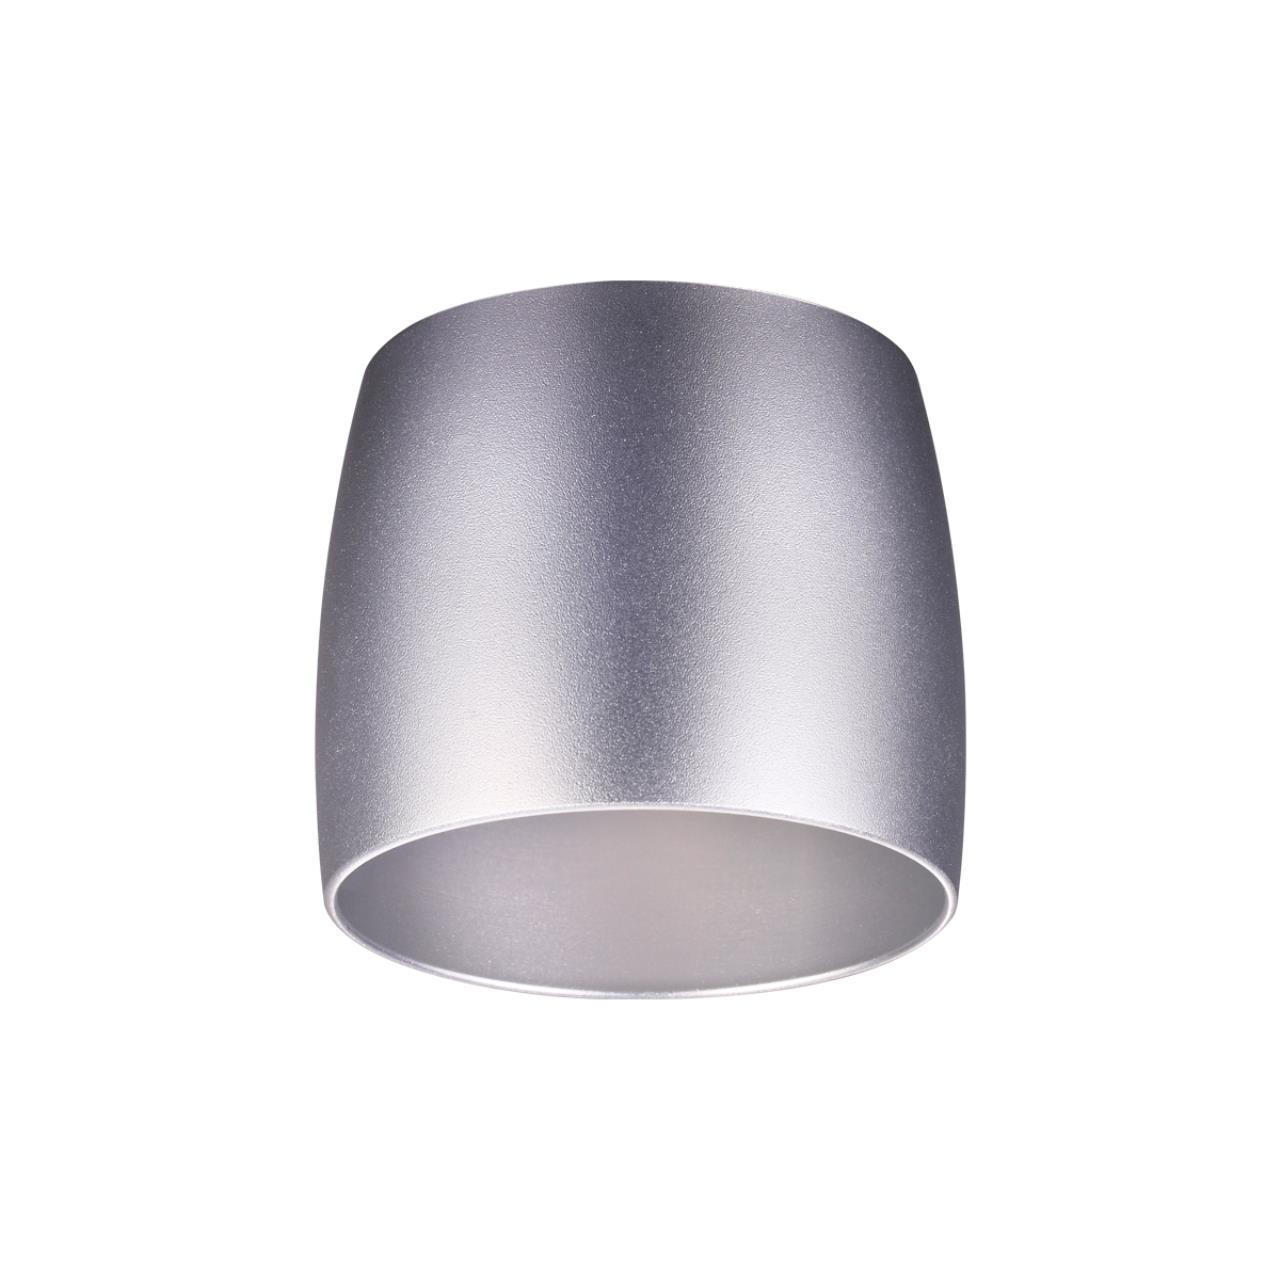 370611 KONST NT19 030 серебро Плафон к арт. 370605, 370606, 370607, 370608 IP20 220V UNIT